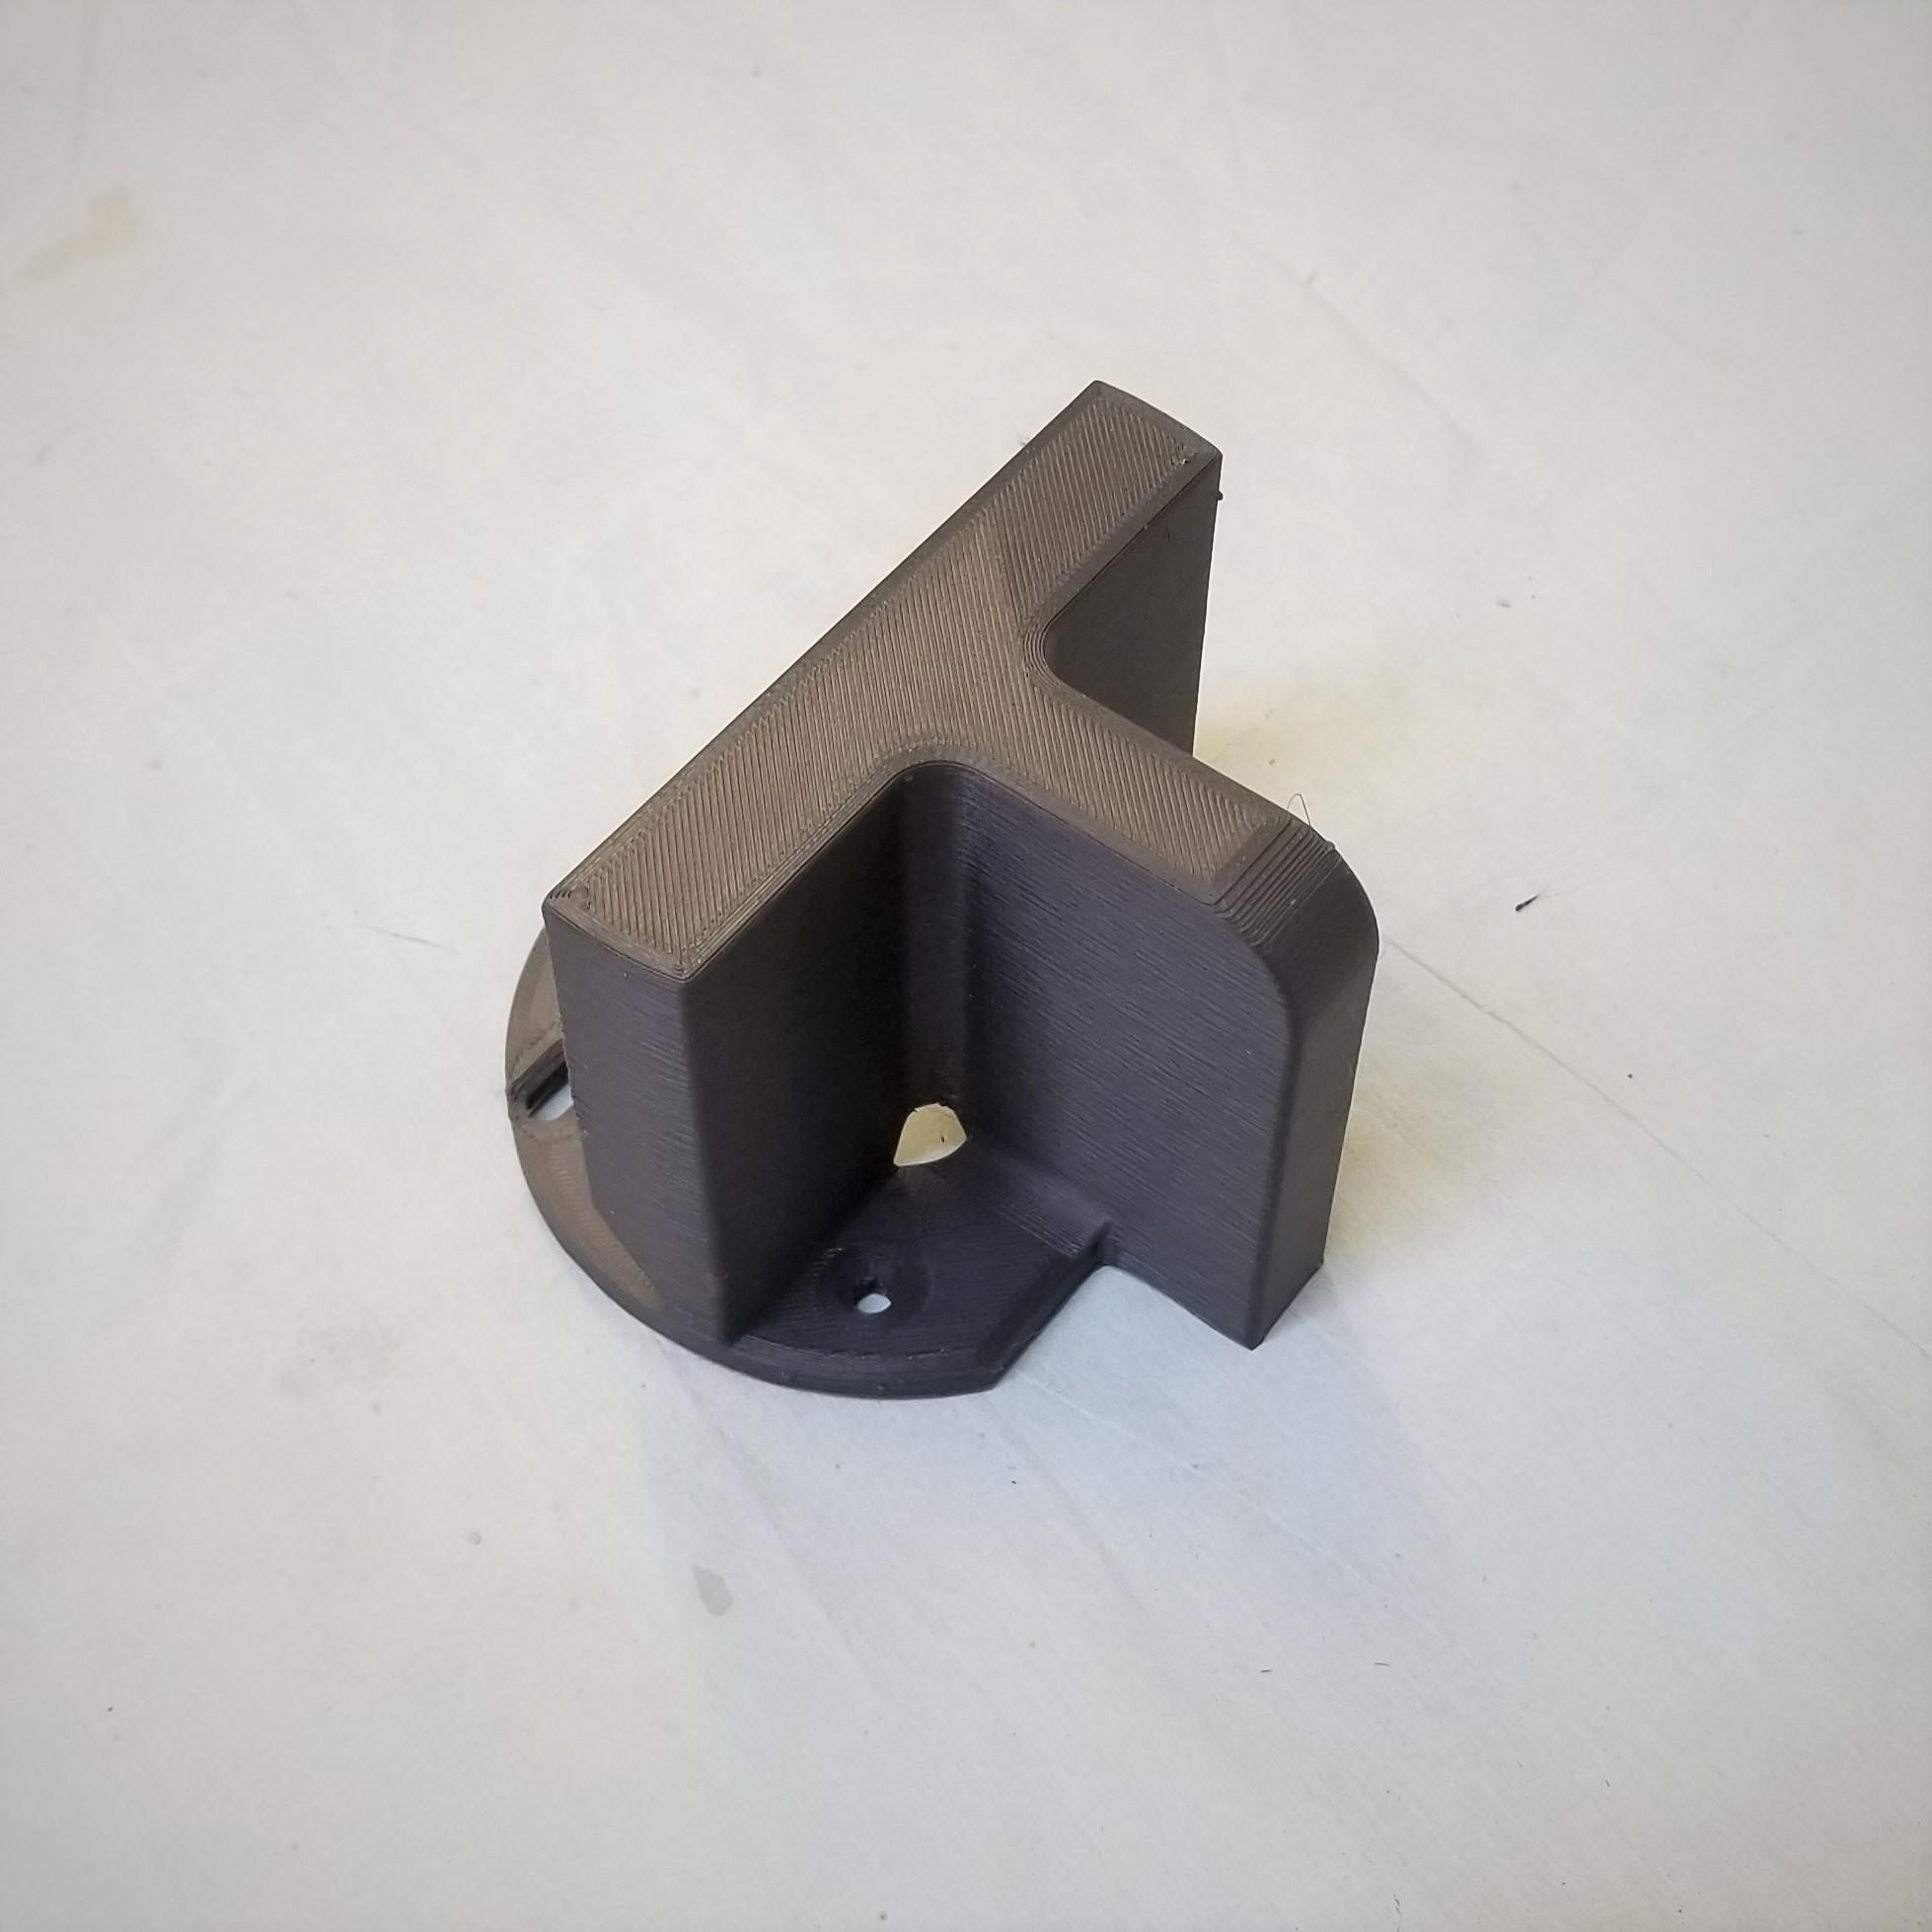 20191012_191817.jpg Download free STL file Makita banding trim attachment • 3D printing design, jimjax